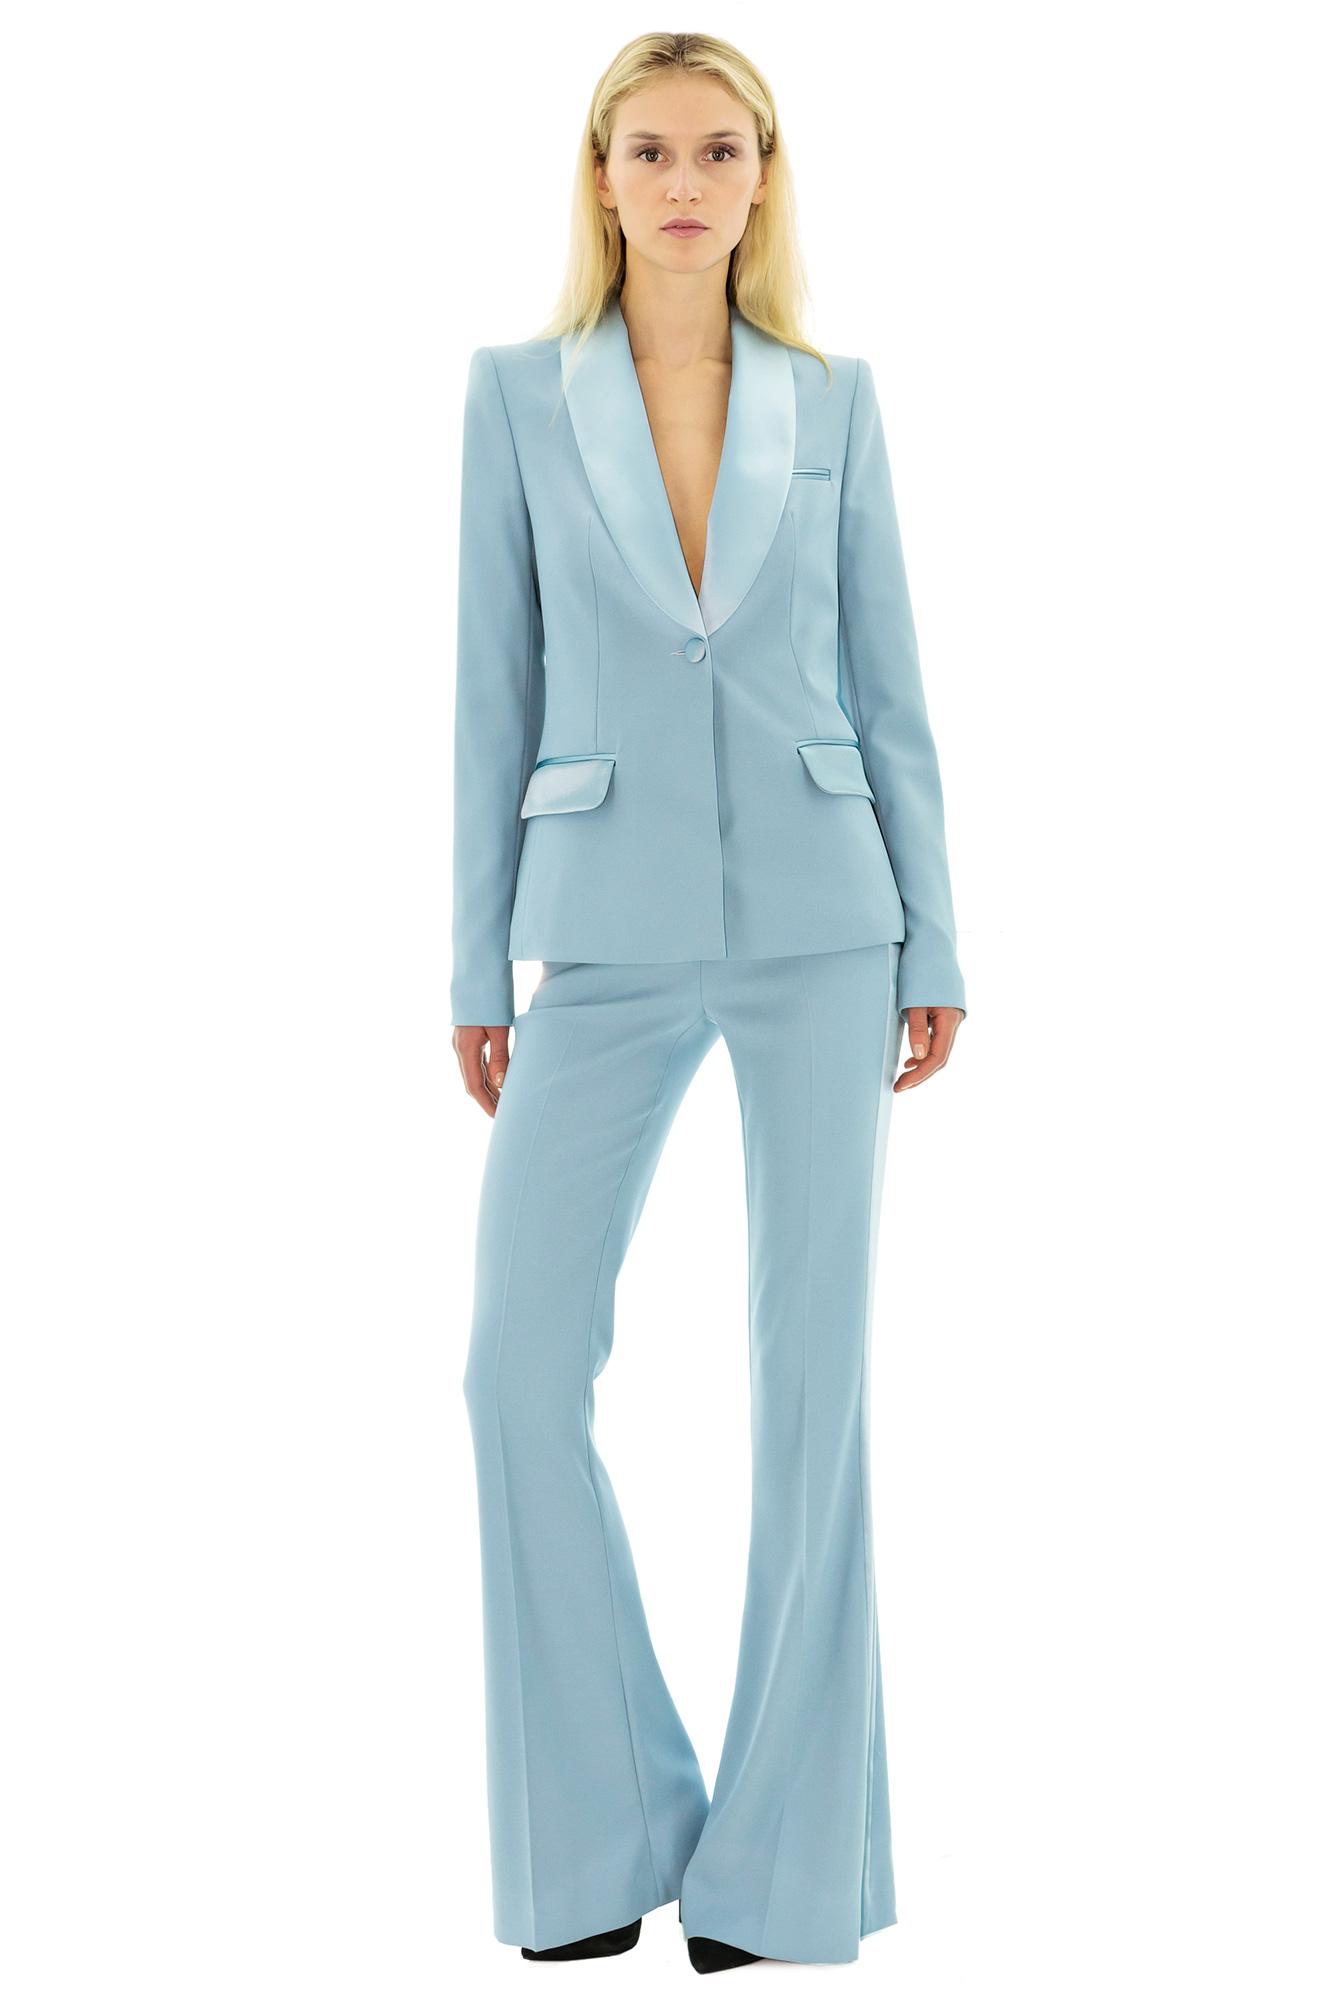 pantalon de smoking bleu ciel smoking de couleur smoking bleu stefanie renoma. Black Bedroom Furniture Sets. Home Design Ideas